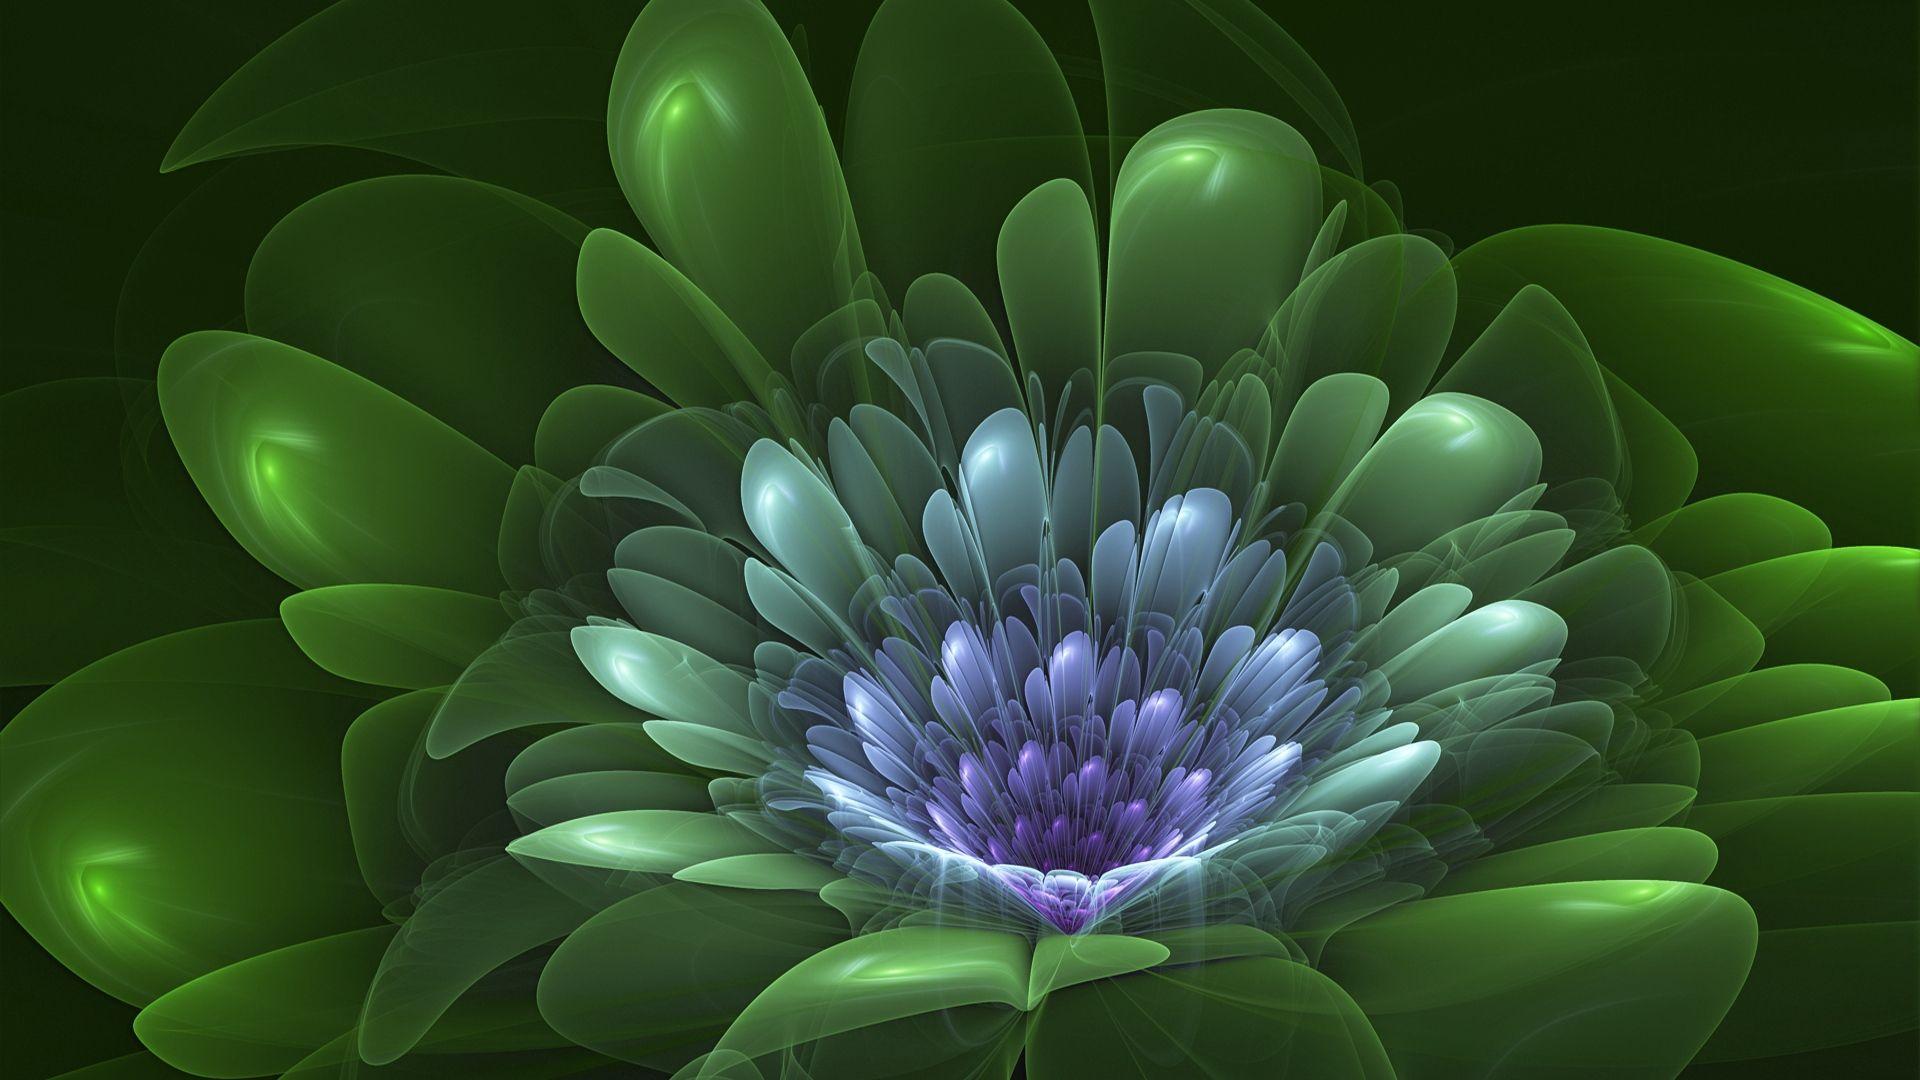 Fractal Flower wallpaper image hd